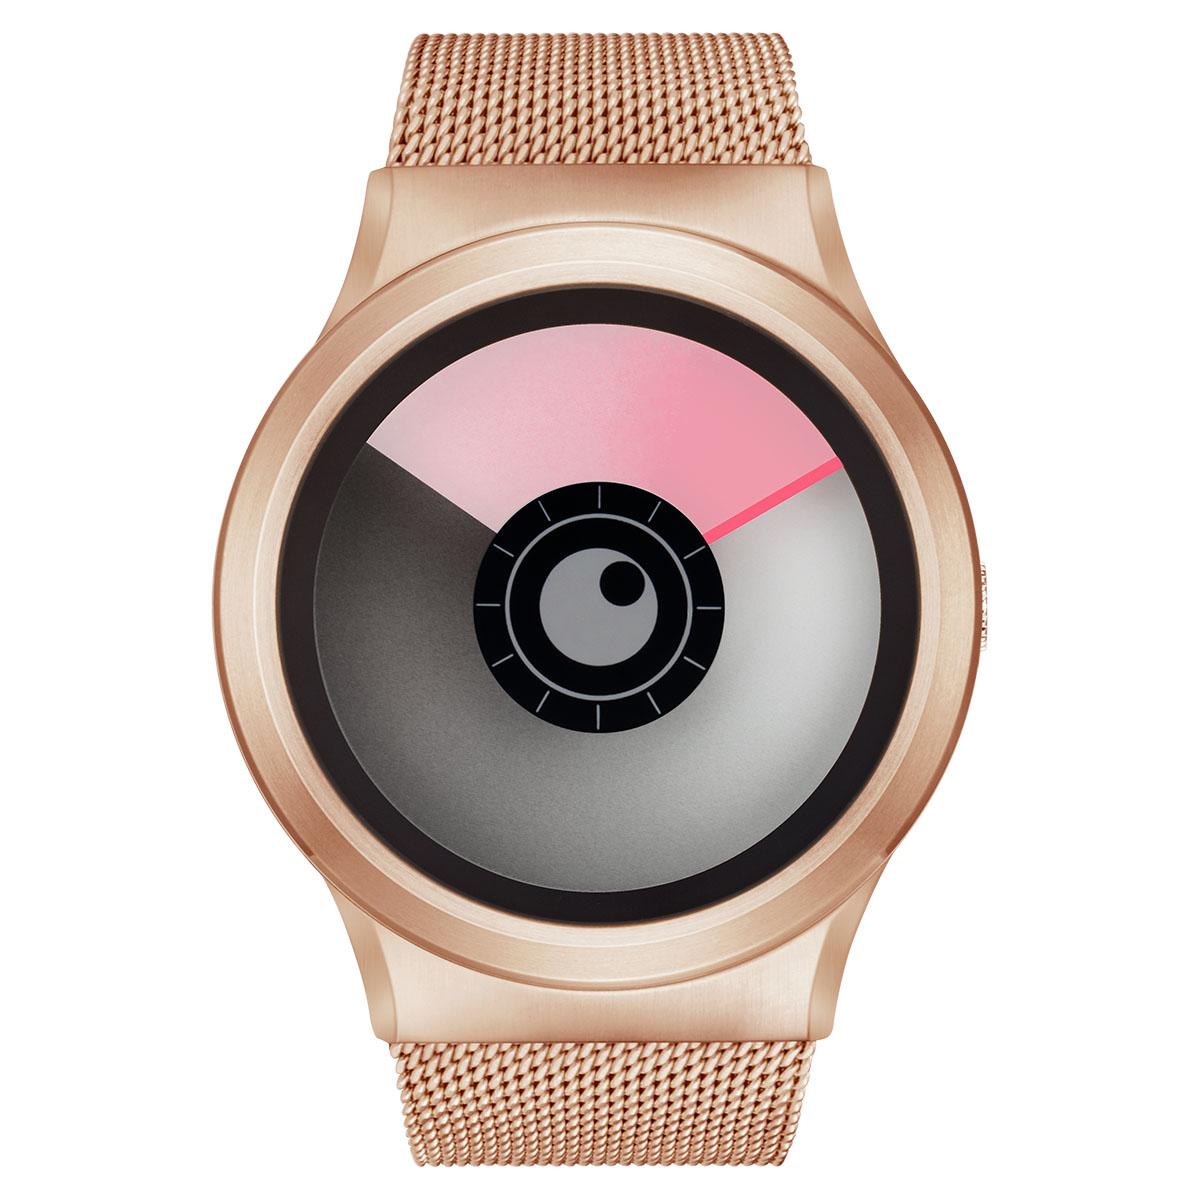 ZEROO AURORA BOREALIS ゼロ 電池式クォーツ 腕時計 [W12020B05SM05] ピンク デザインウォッチ ペア用 メンズ レディース ユニセックス おしゃれ時計 デザイナーズ